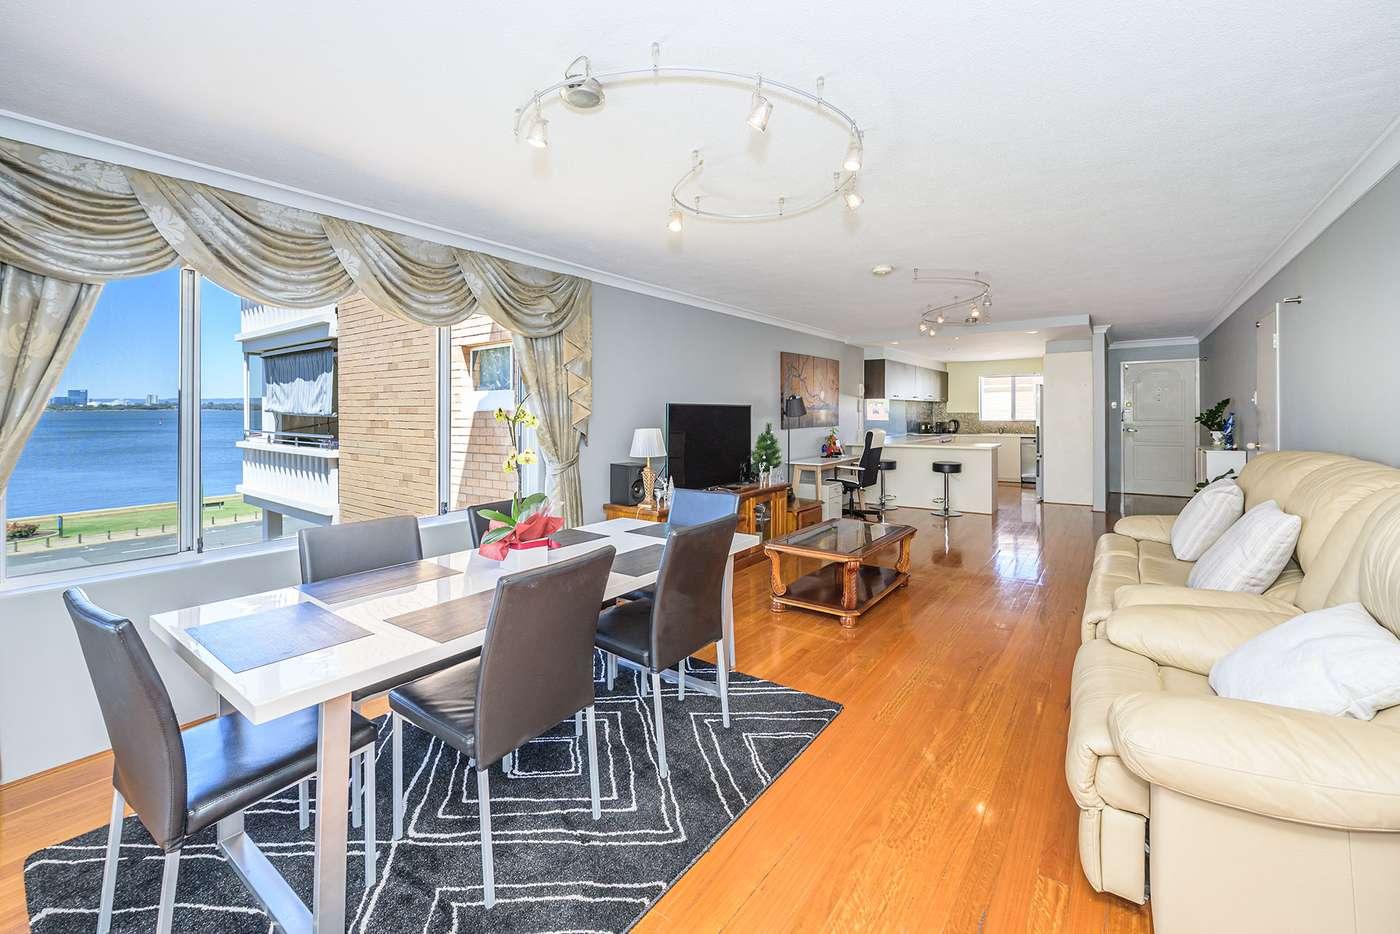 Main view of Homely apartment listing, 31/39 South Perth Esplanade, South Perth WA 6151